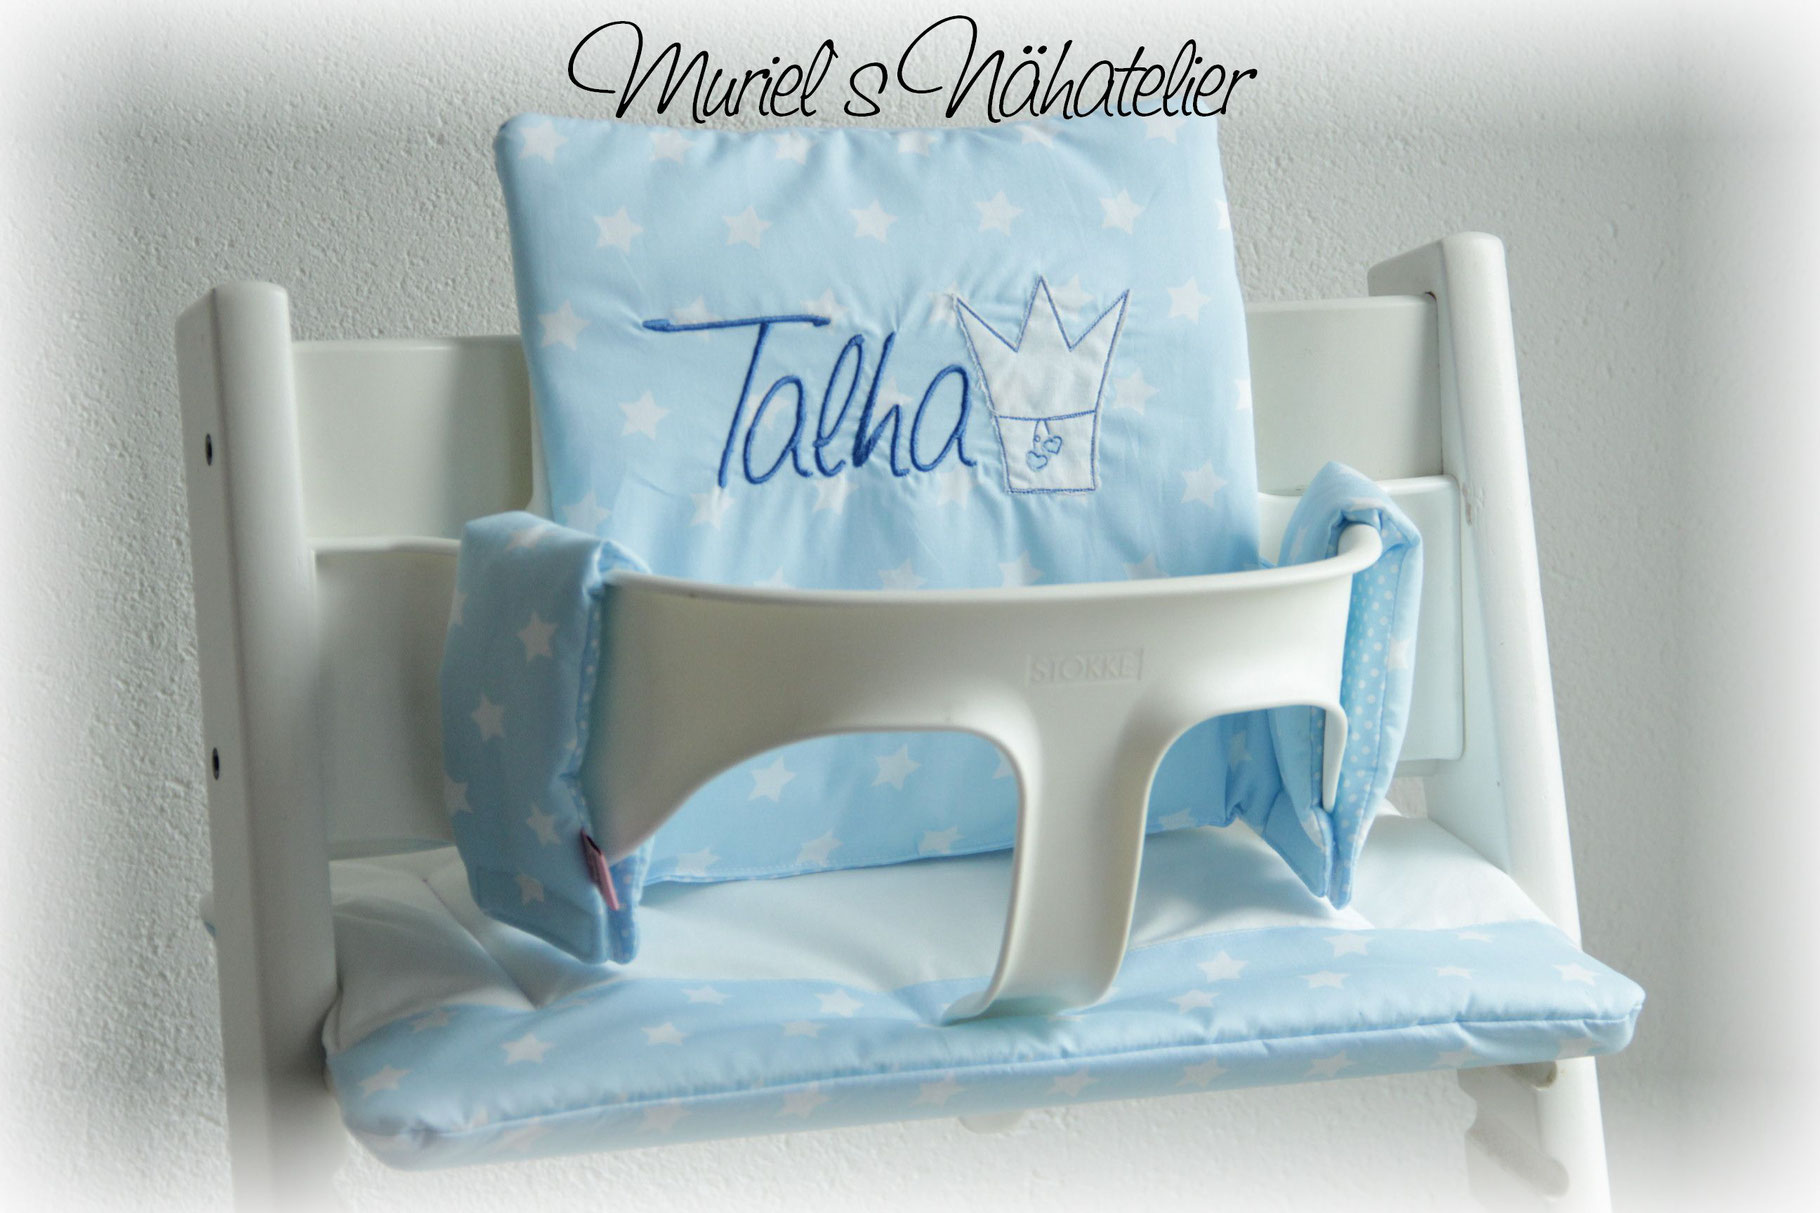 tripp trapp kissen prinzessin muriels n hatelier. Black Bedroom Furniture Sets. Home Design Ideas